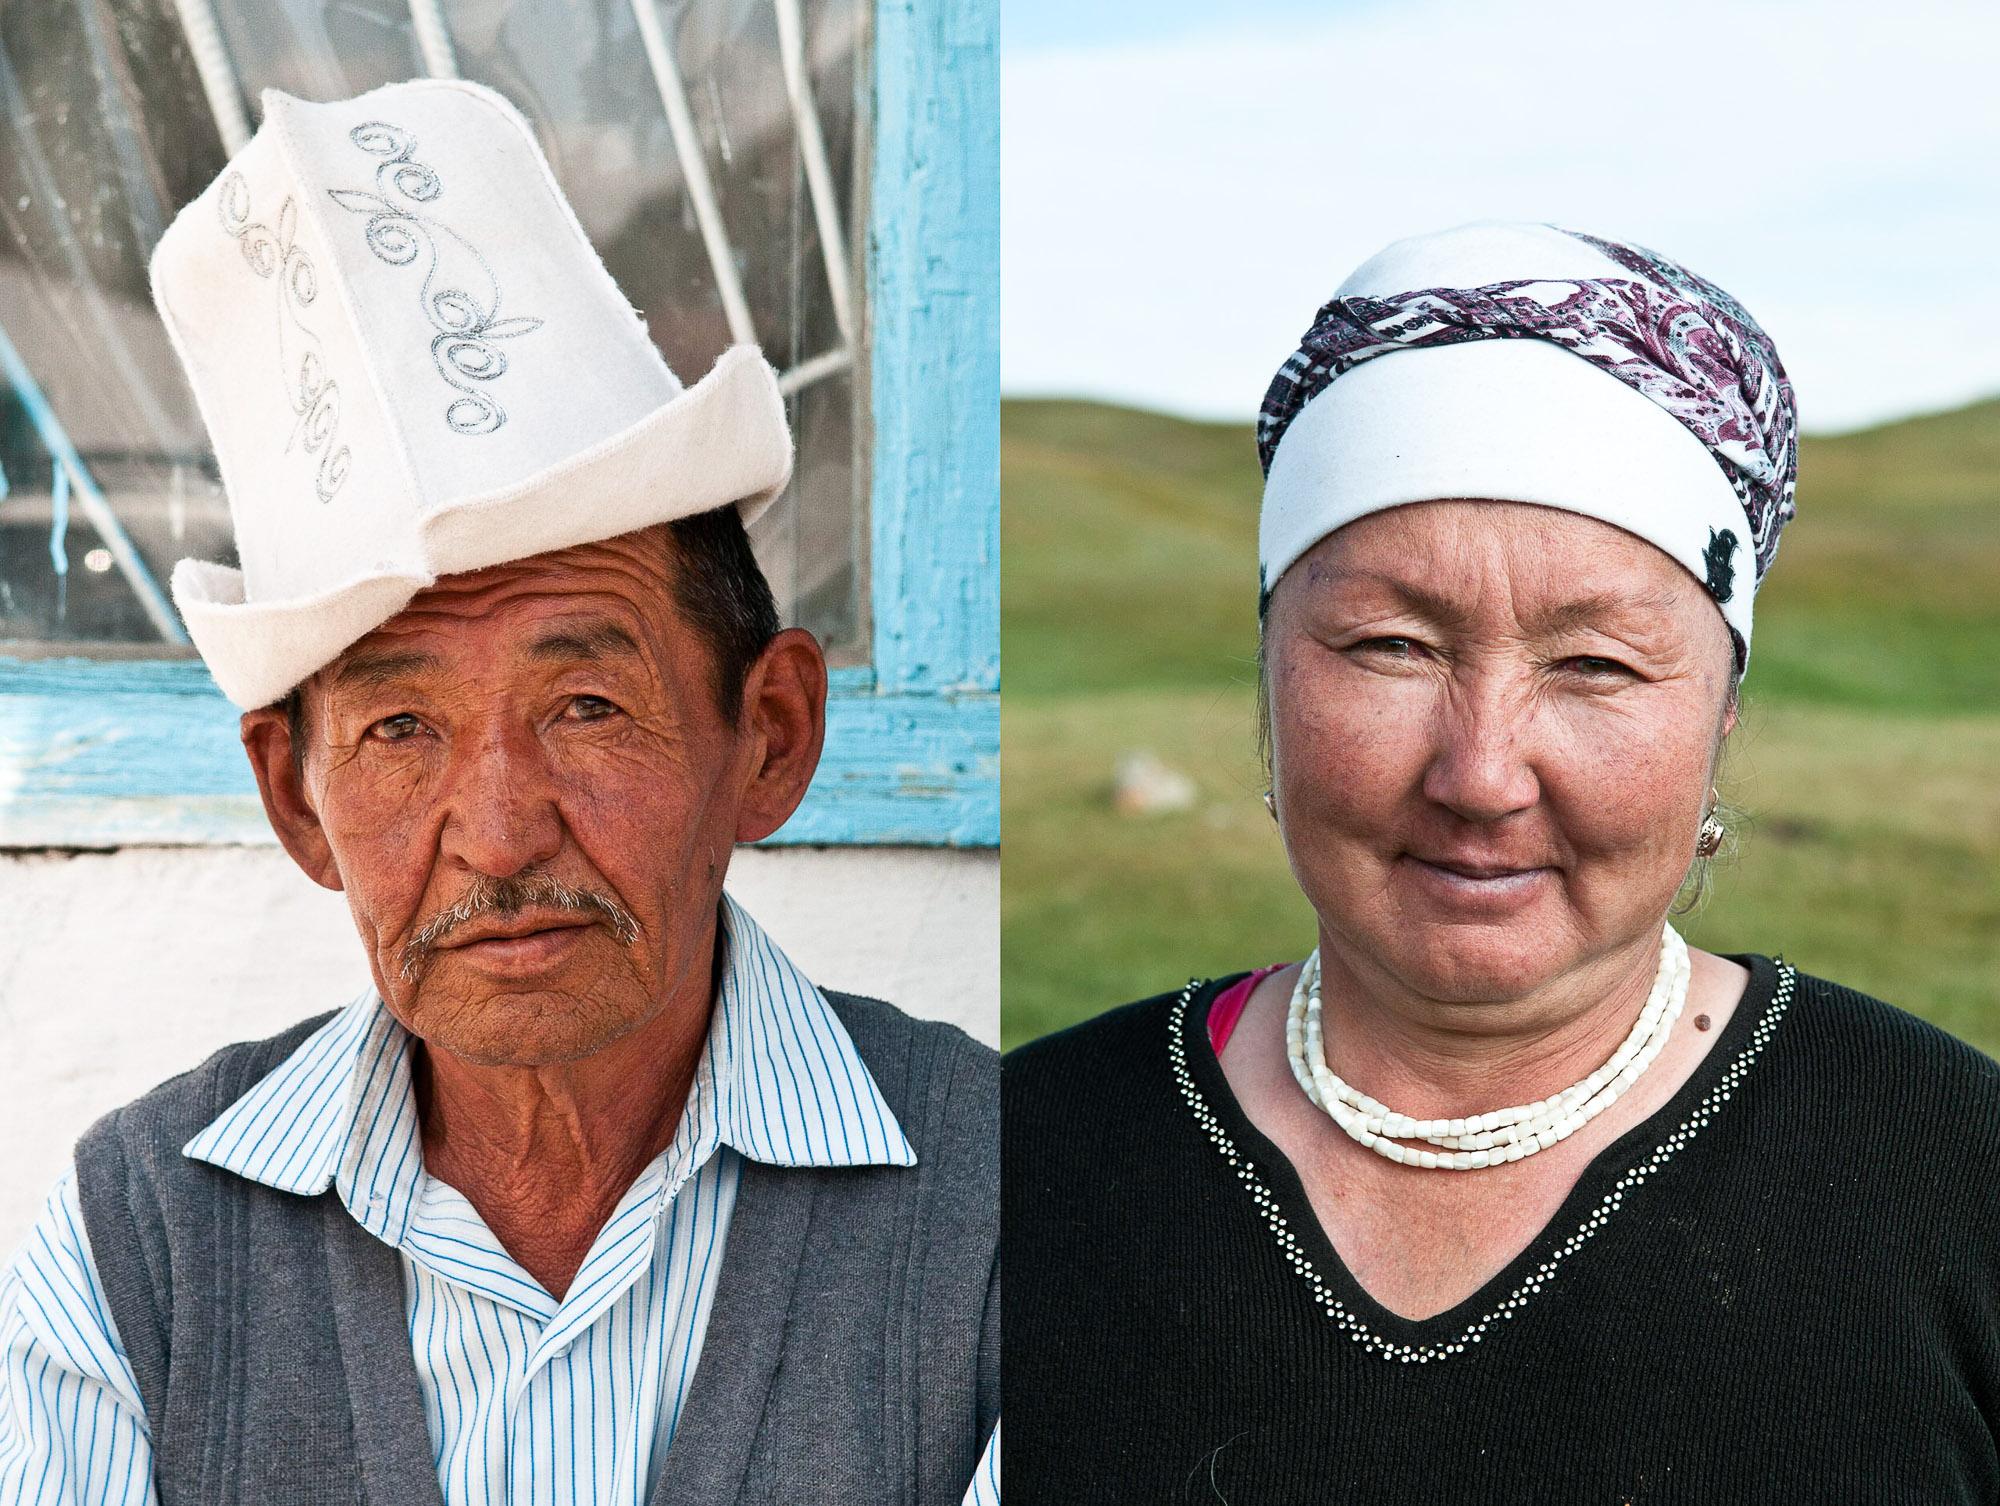 People of Kyrygyzstan. © www.thomaspickard.com